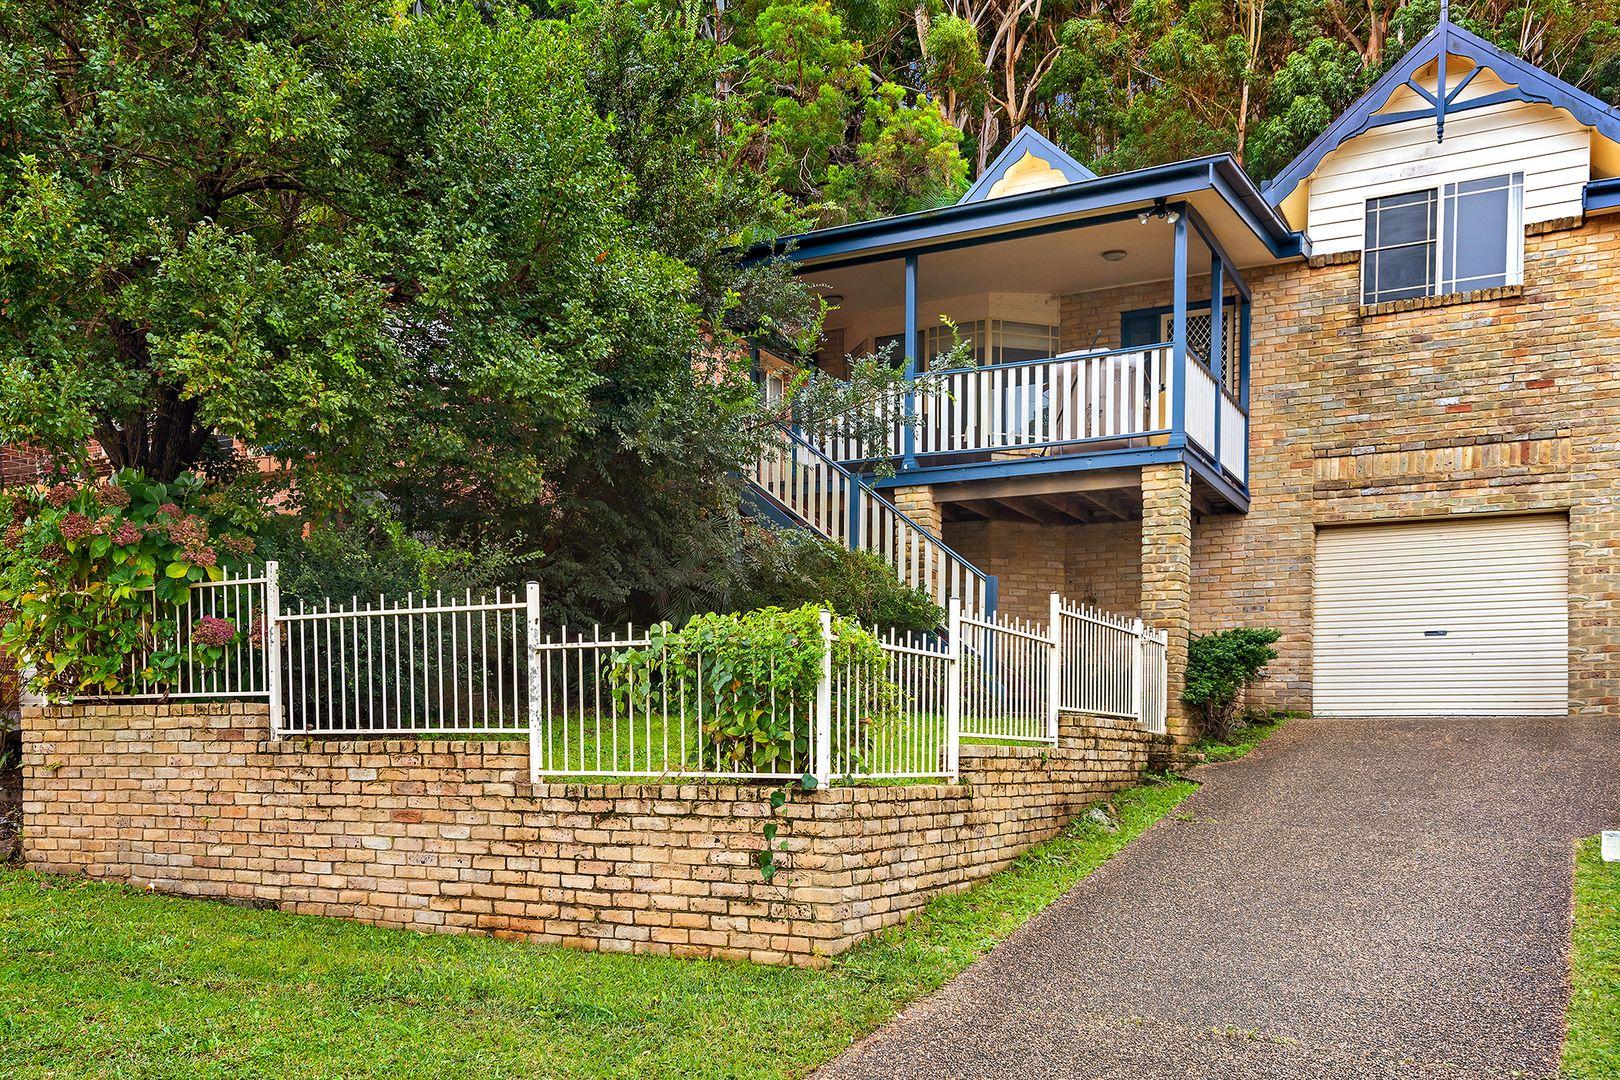 1/48 Kookaburra Street, Kincumber NSW 2251, Image 0